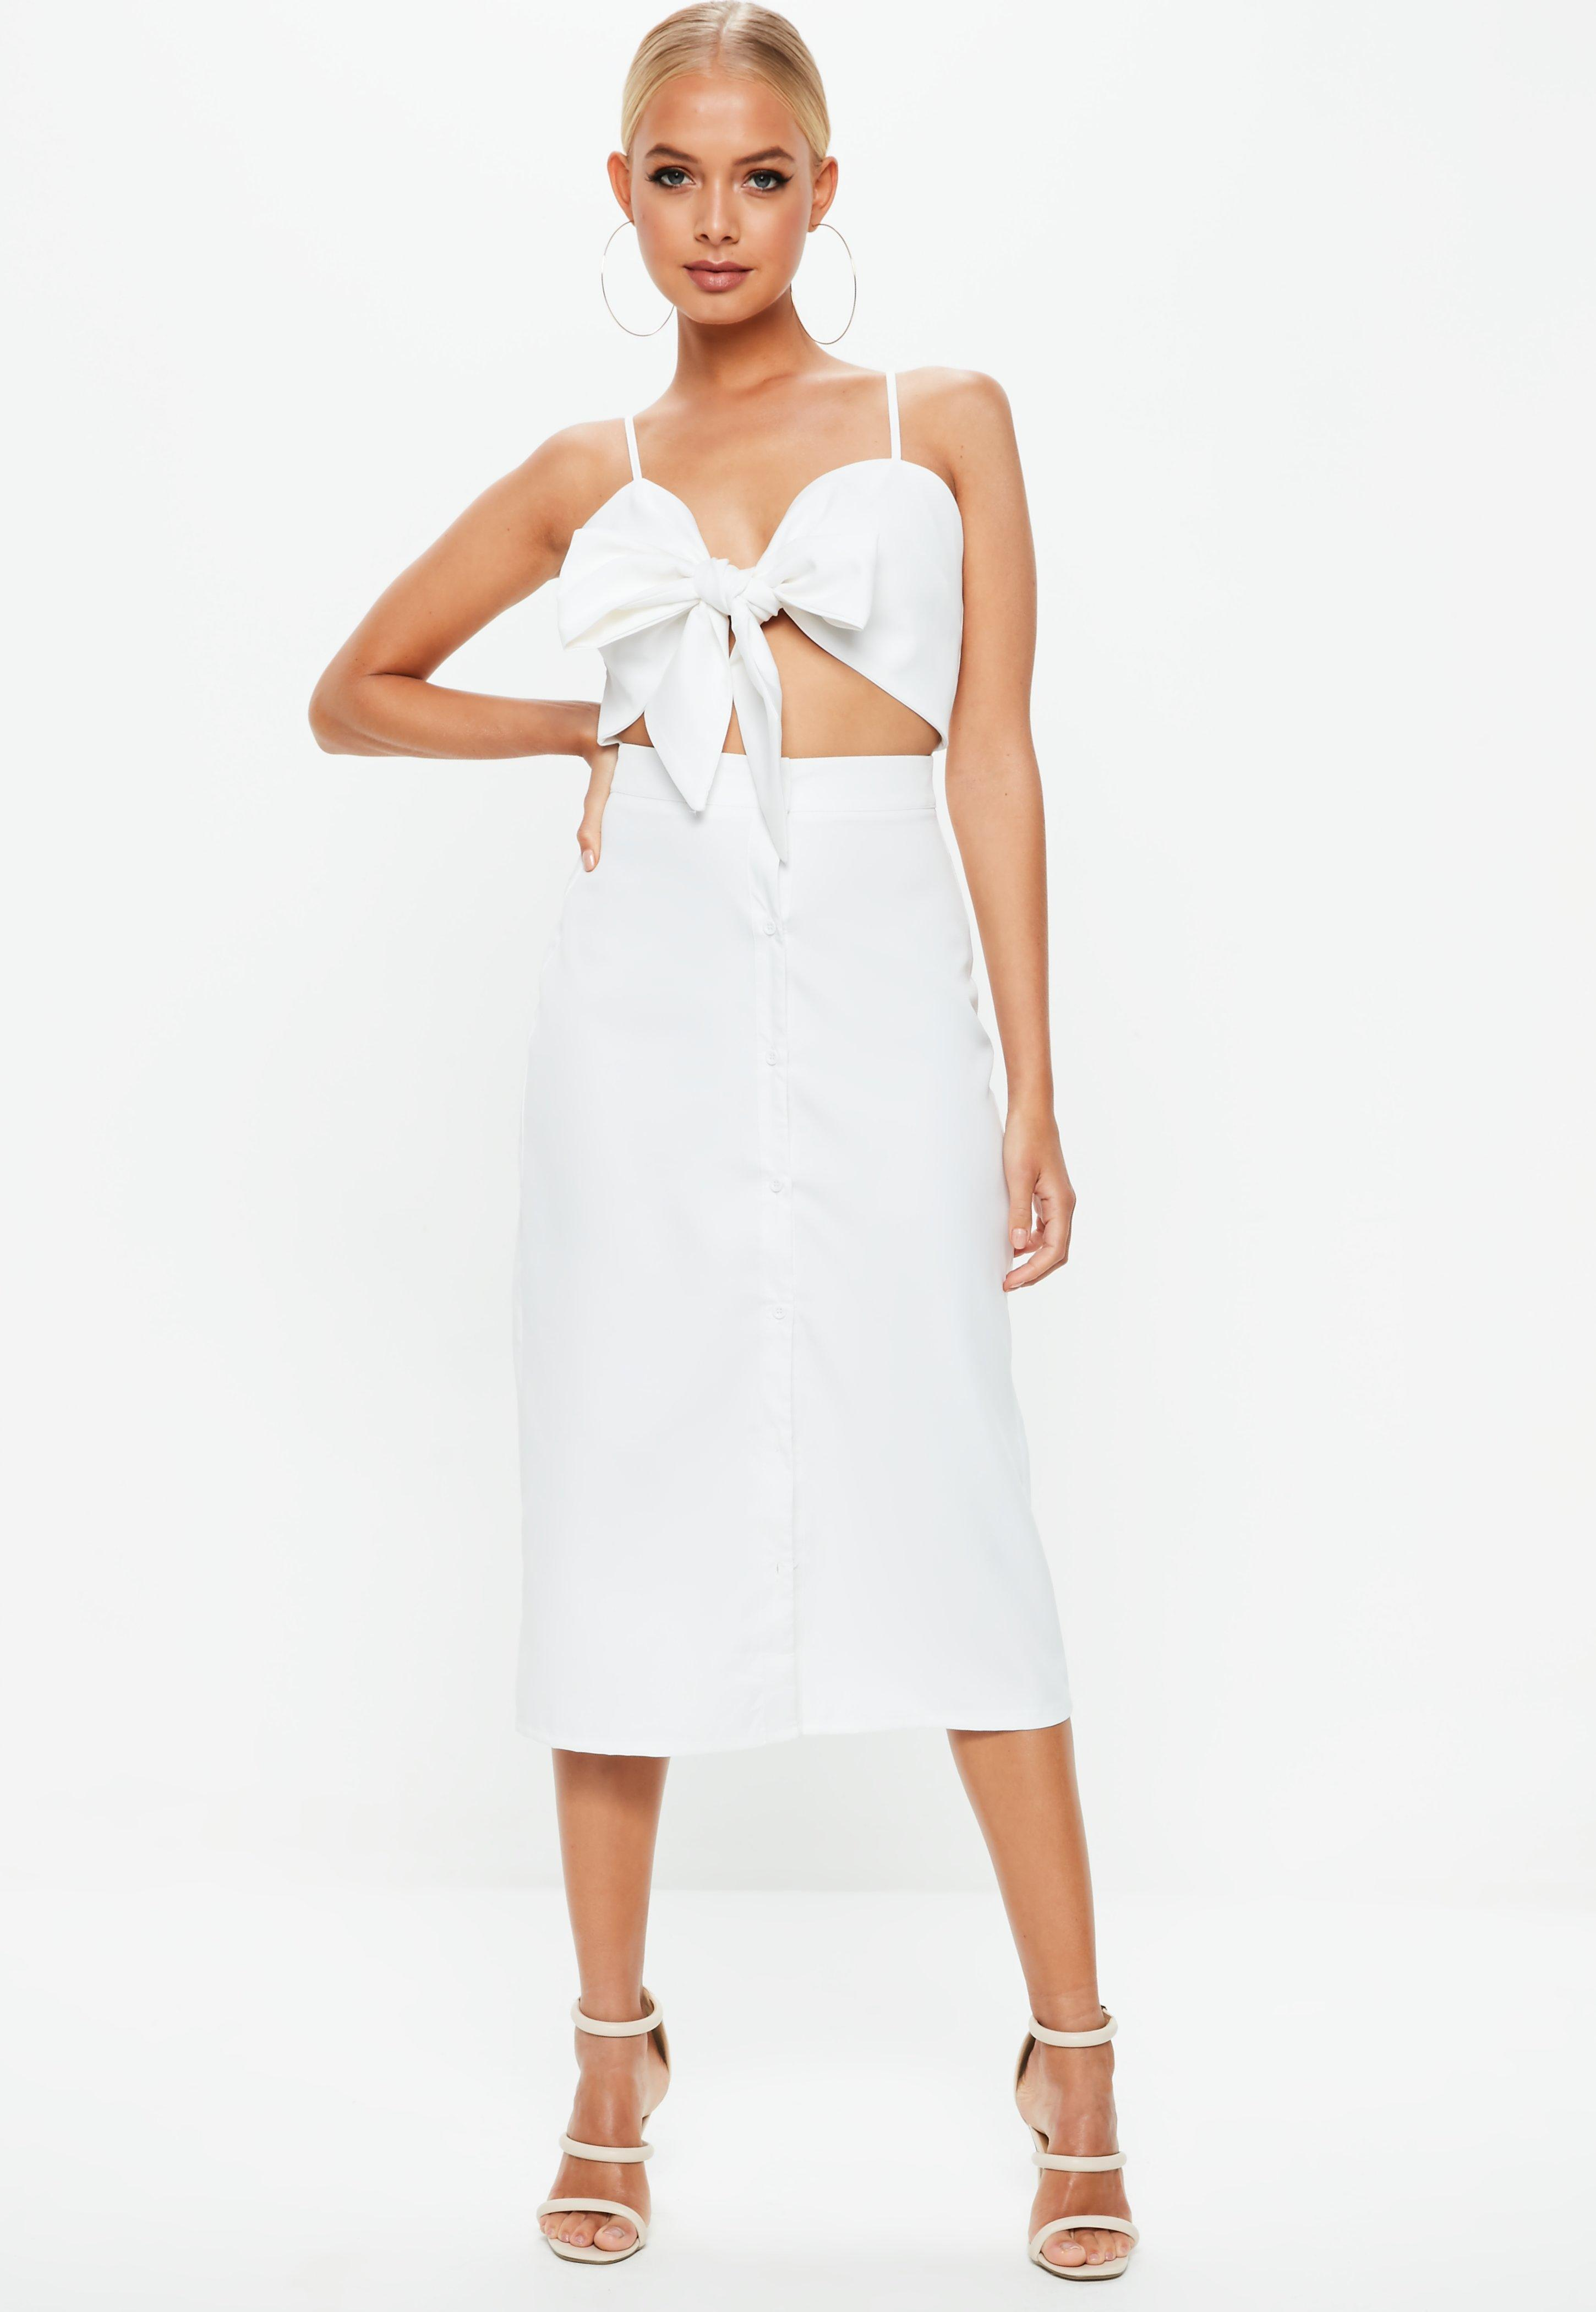 5c5353c8 Missguided White Tie Front Button Down Strappy Midi Dress in White ...